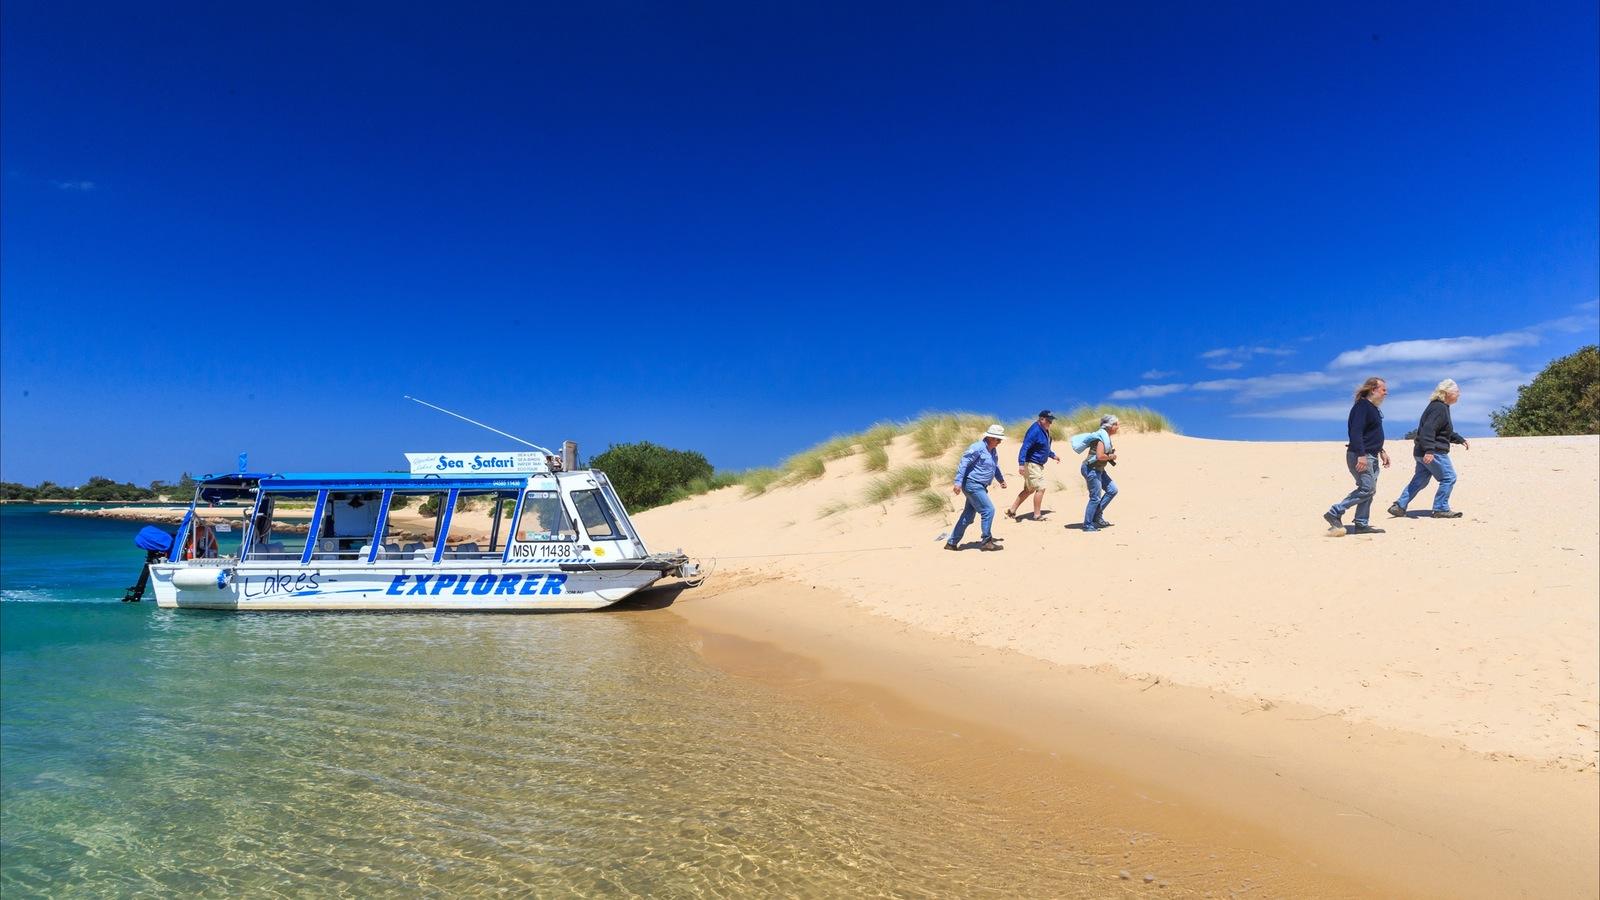 Sea-Safari on Lakes-Explorer